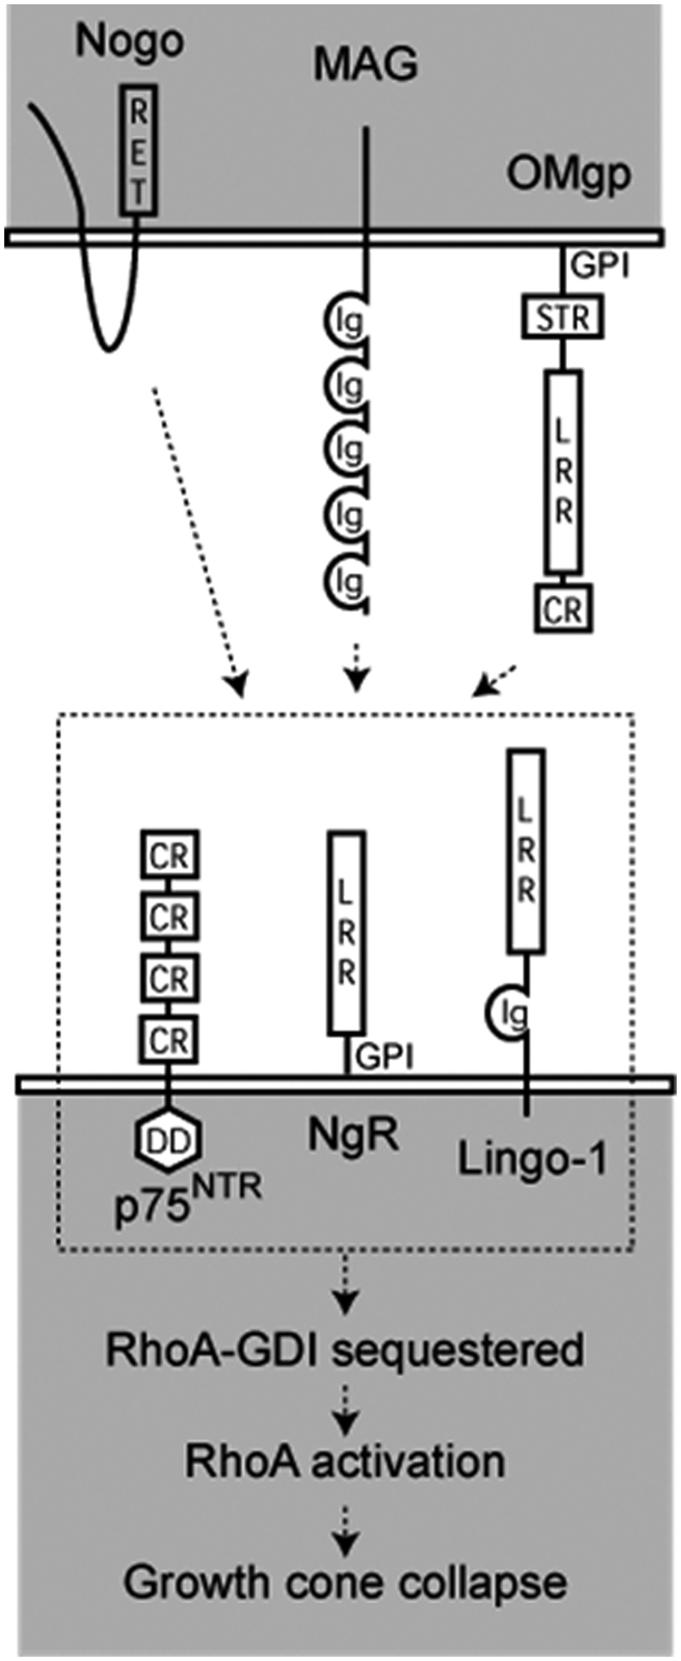 Neural repair: basic cellular and molecular processes